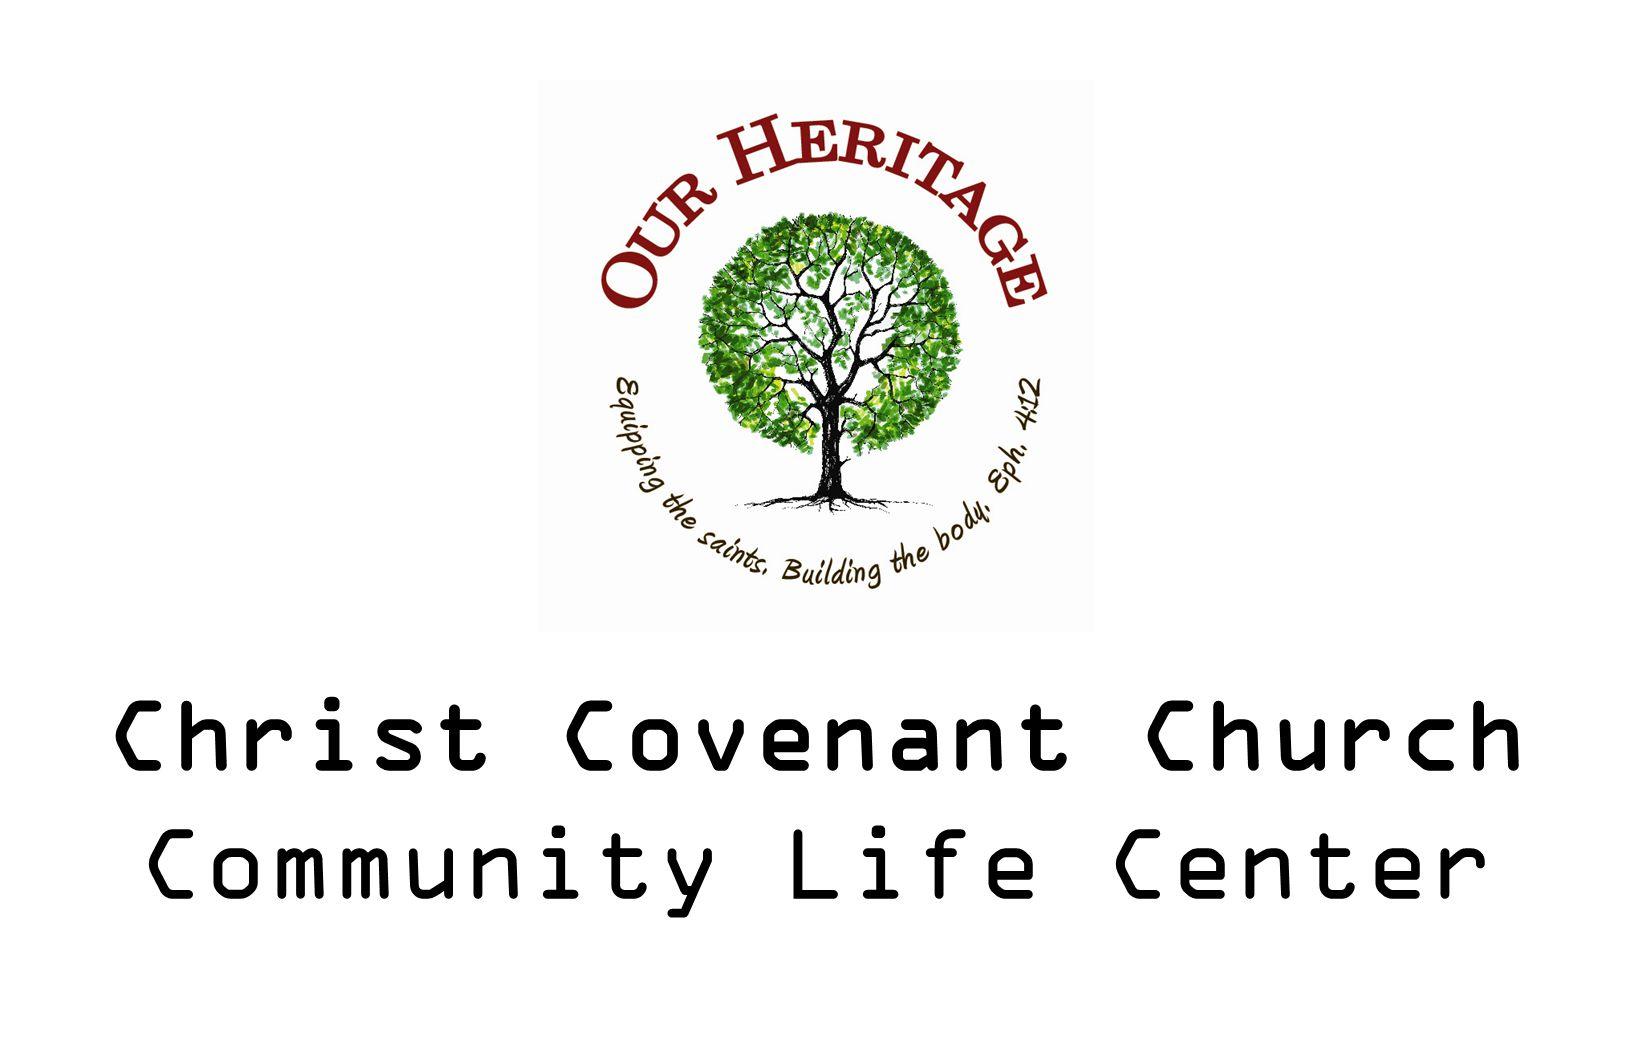 Christ Covenant Church Community Life Center